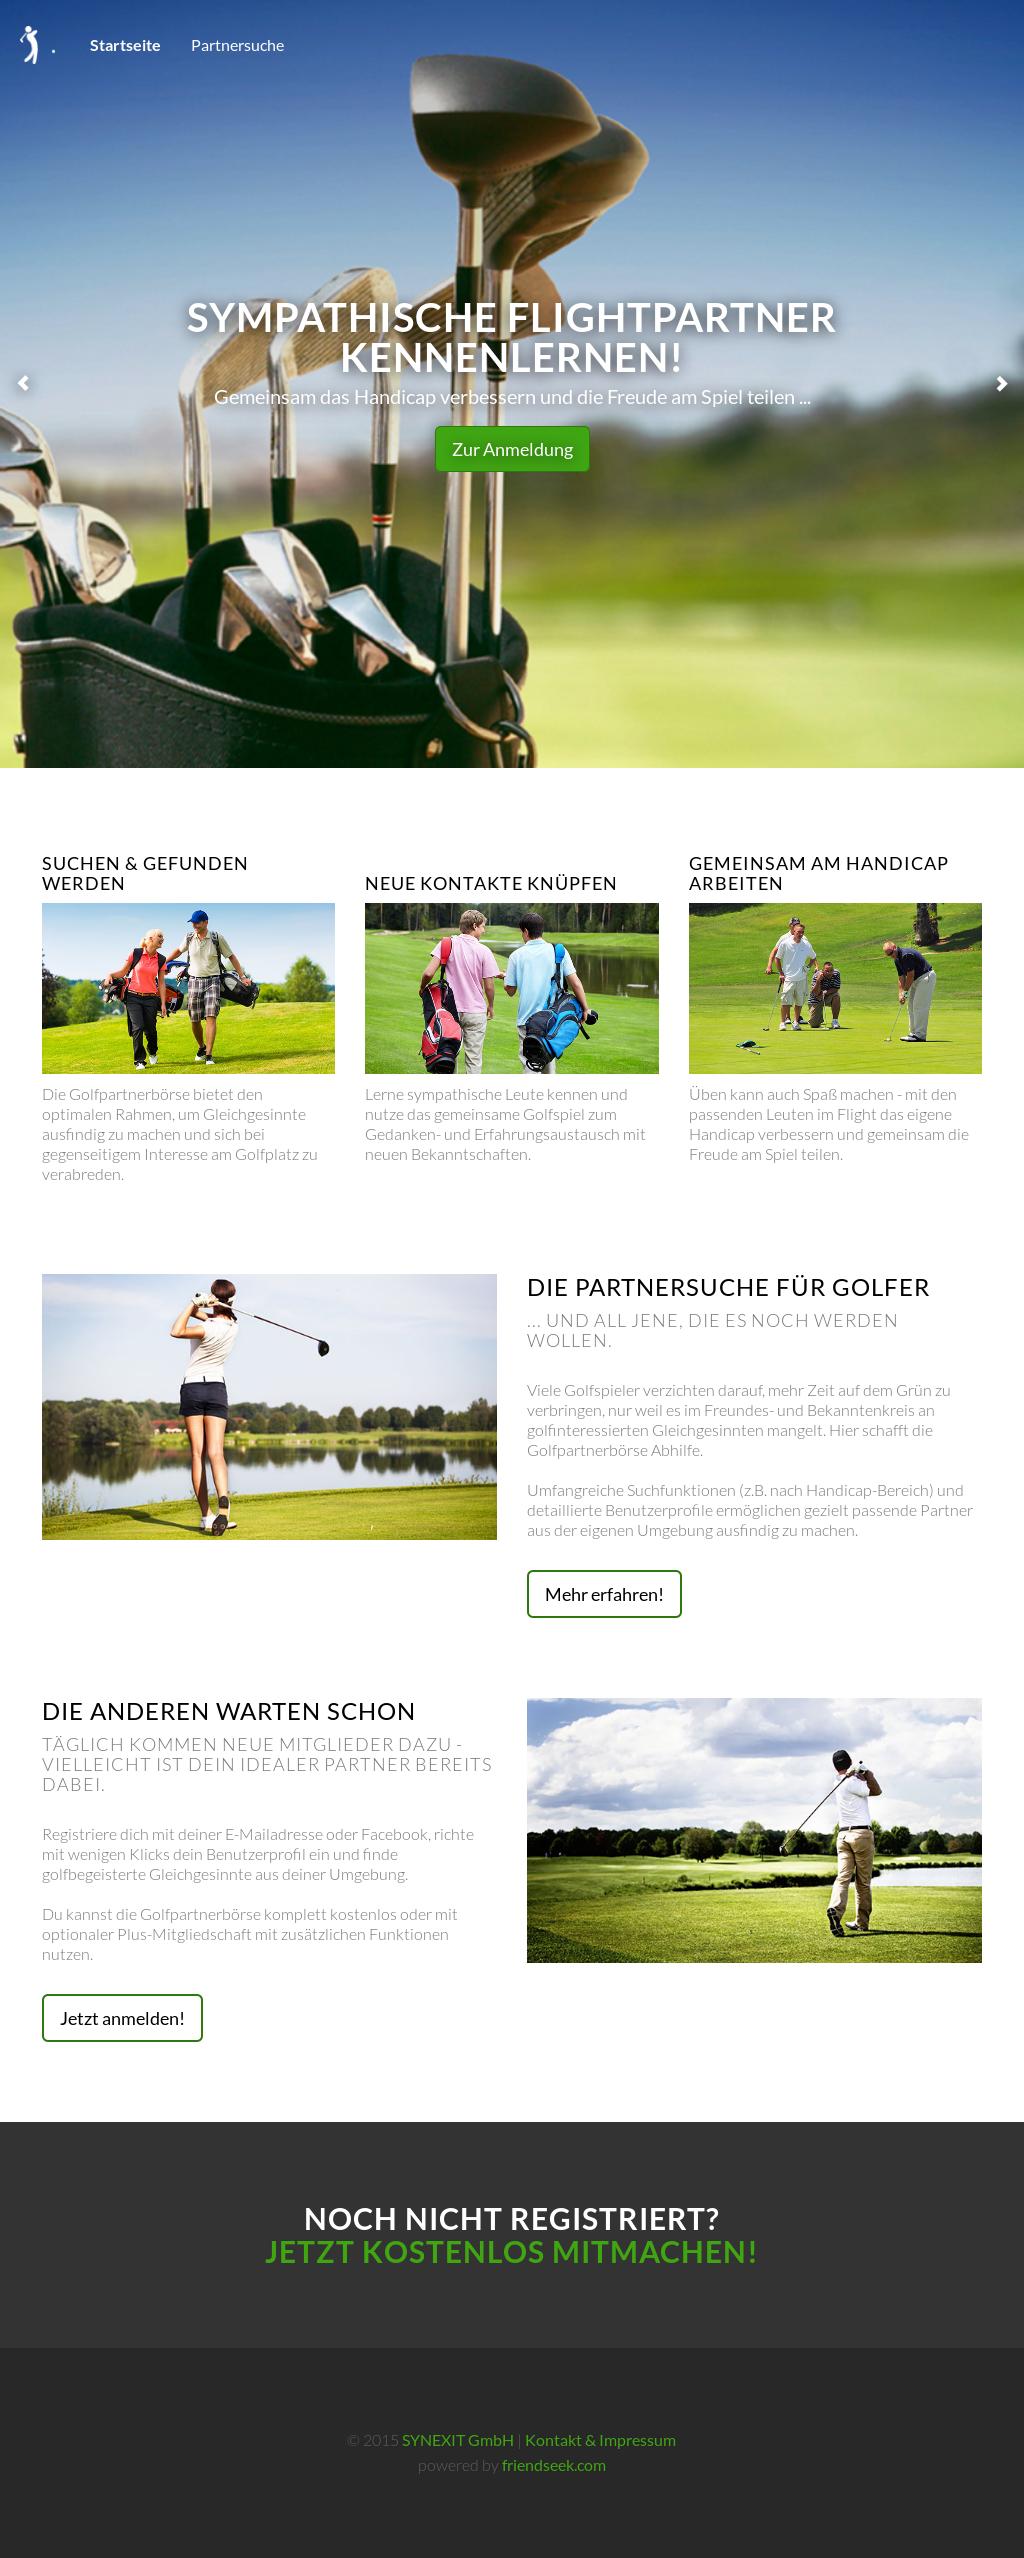 message, matchless))), Partnersuche Dülmen finde deinen Traumpartner remarkable, very valuable